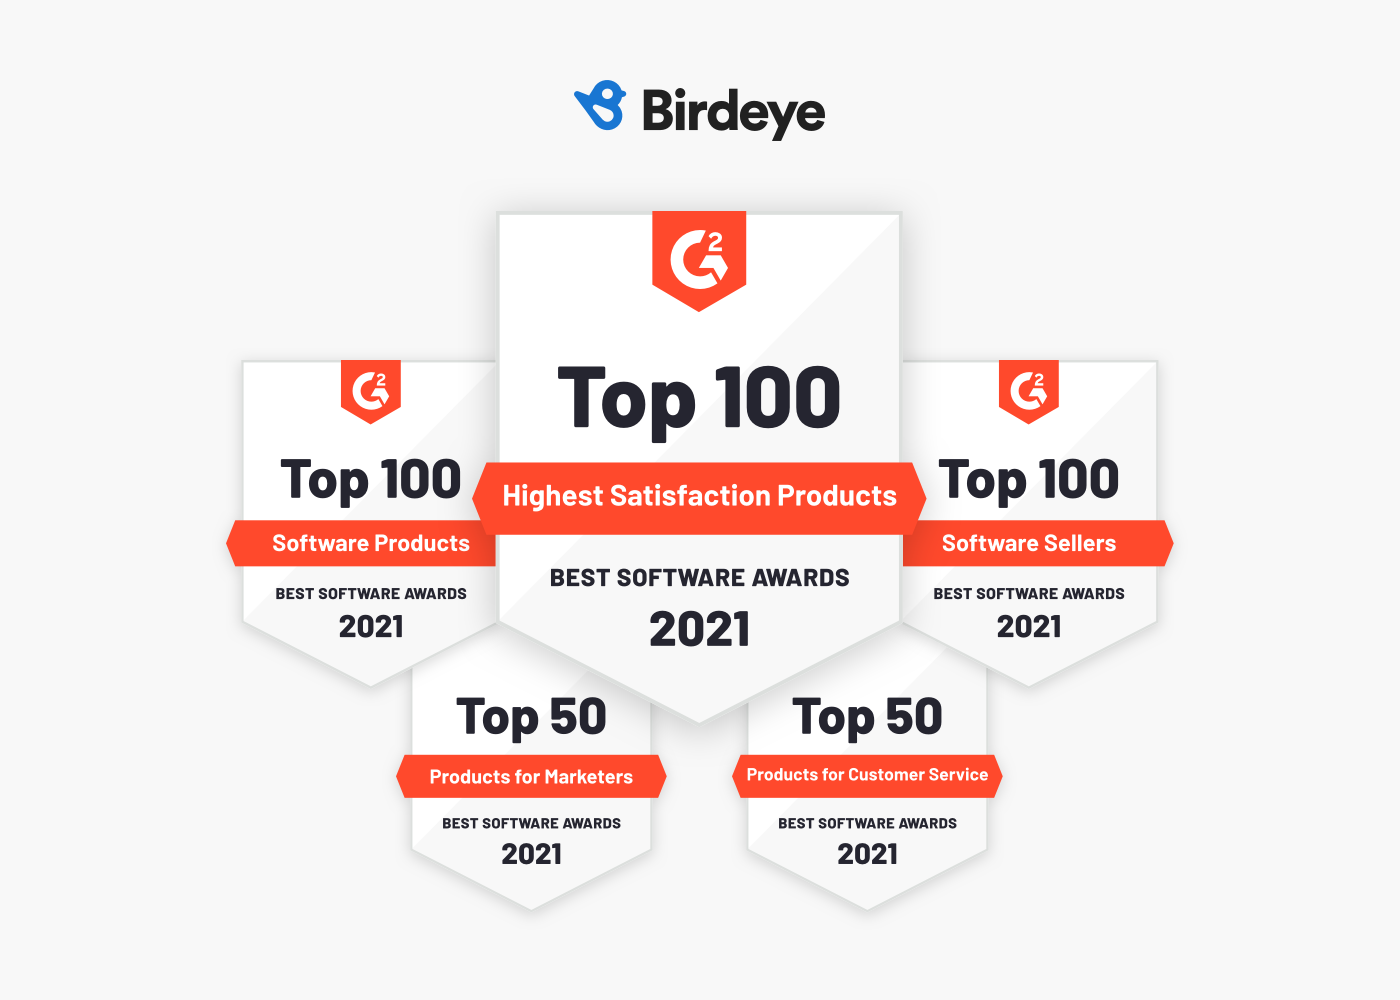 Birdeye Soars To Top Of G2 Again Winning 2021 Awards In Multiple Categories 1613674307419